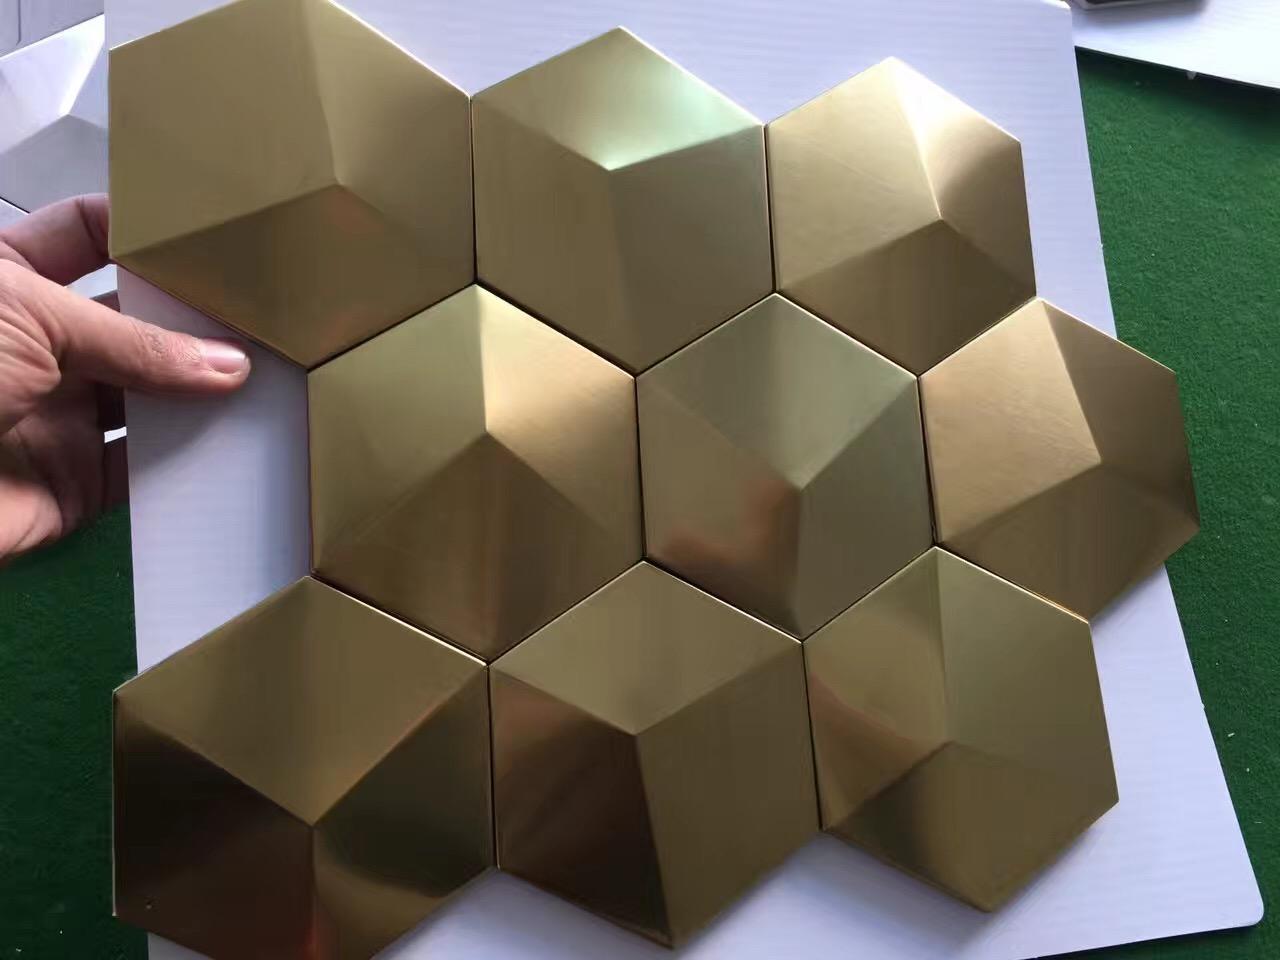 Ceramic Tile Murals For Kitchen Backsplash Gold Metal Mosaic Tile Stainless Steel Tile Pyramid